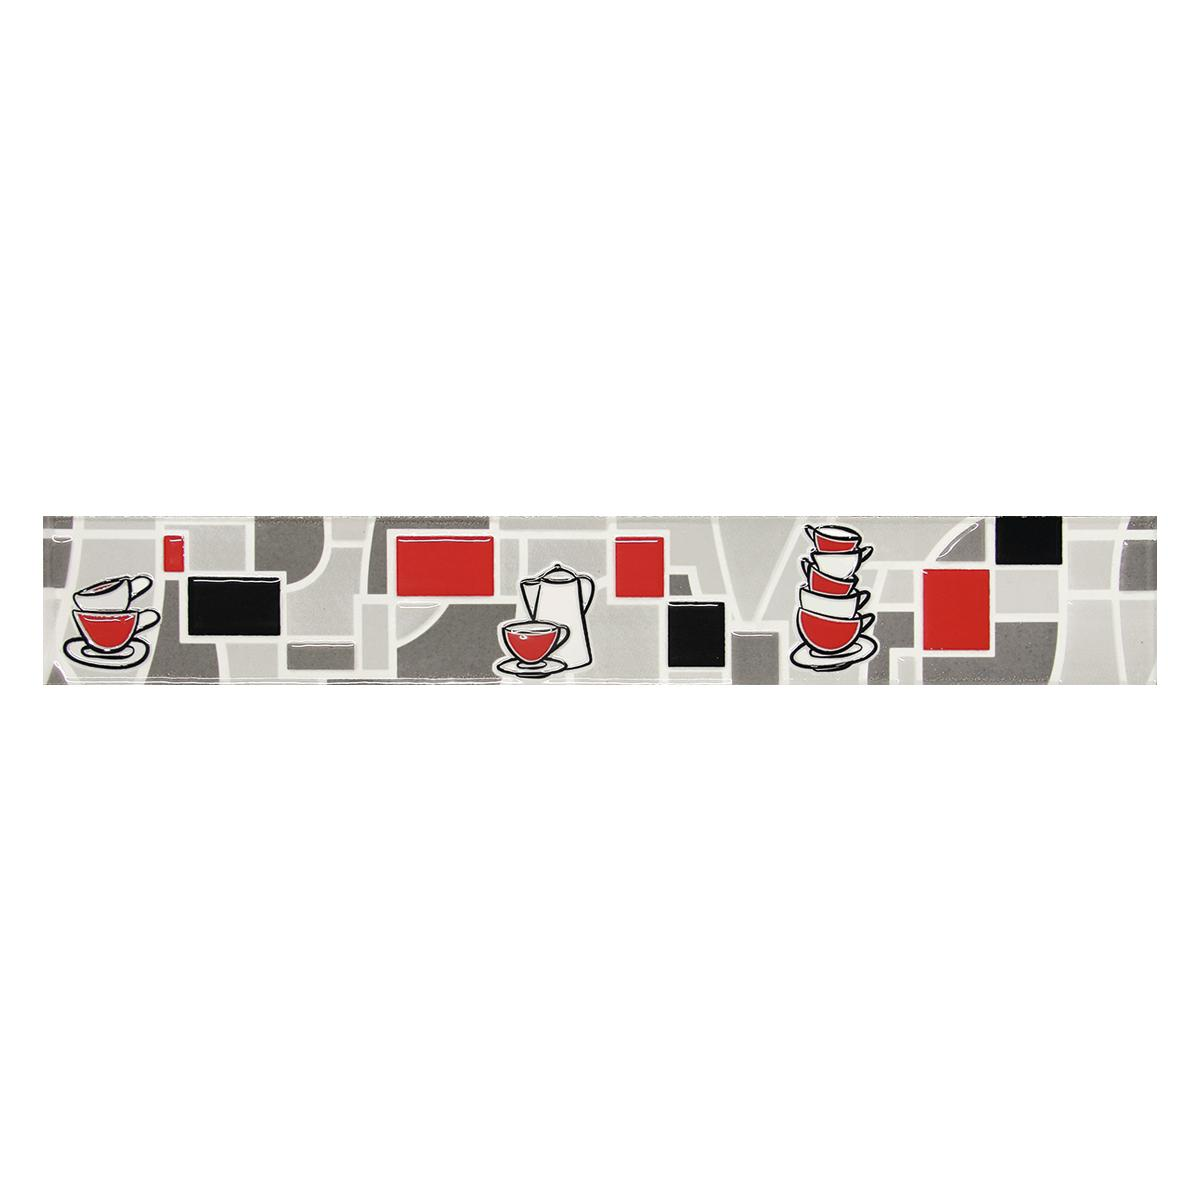 Listelo Decorado Rojo Brillante - 6X39.5 cm - 1 pza